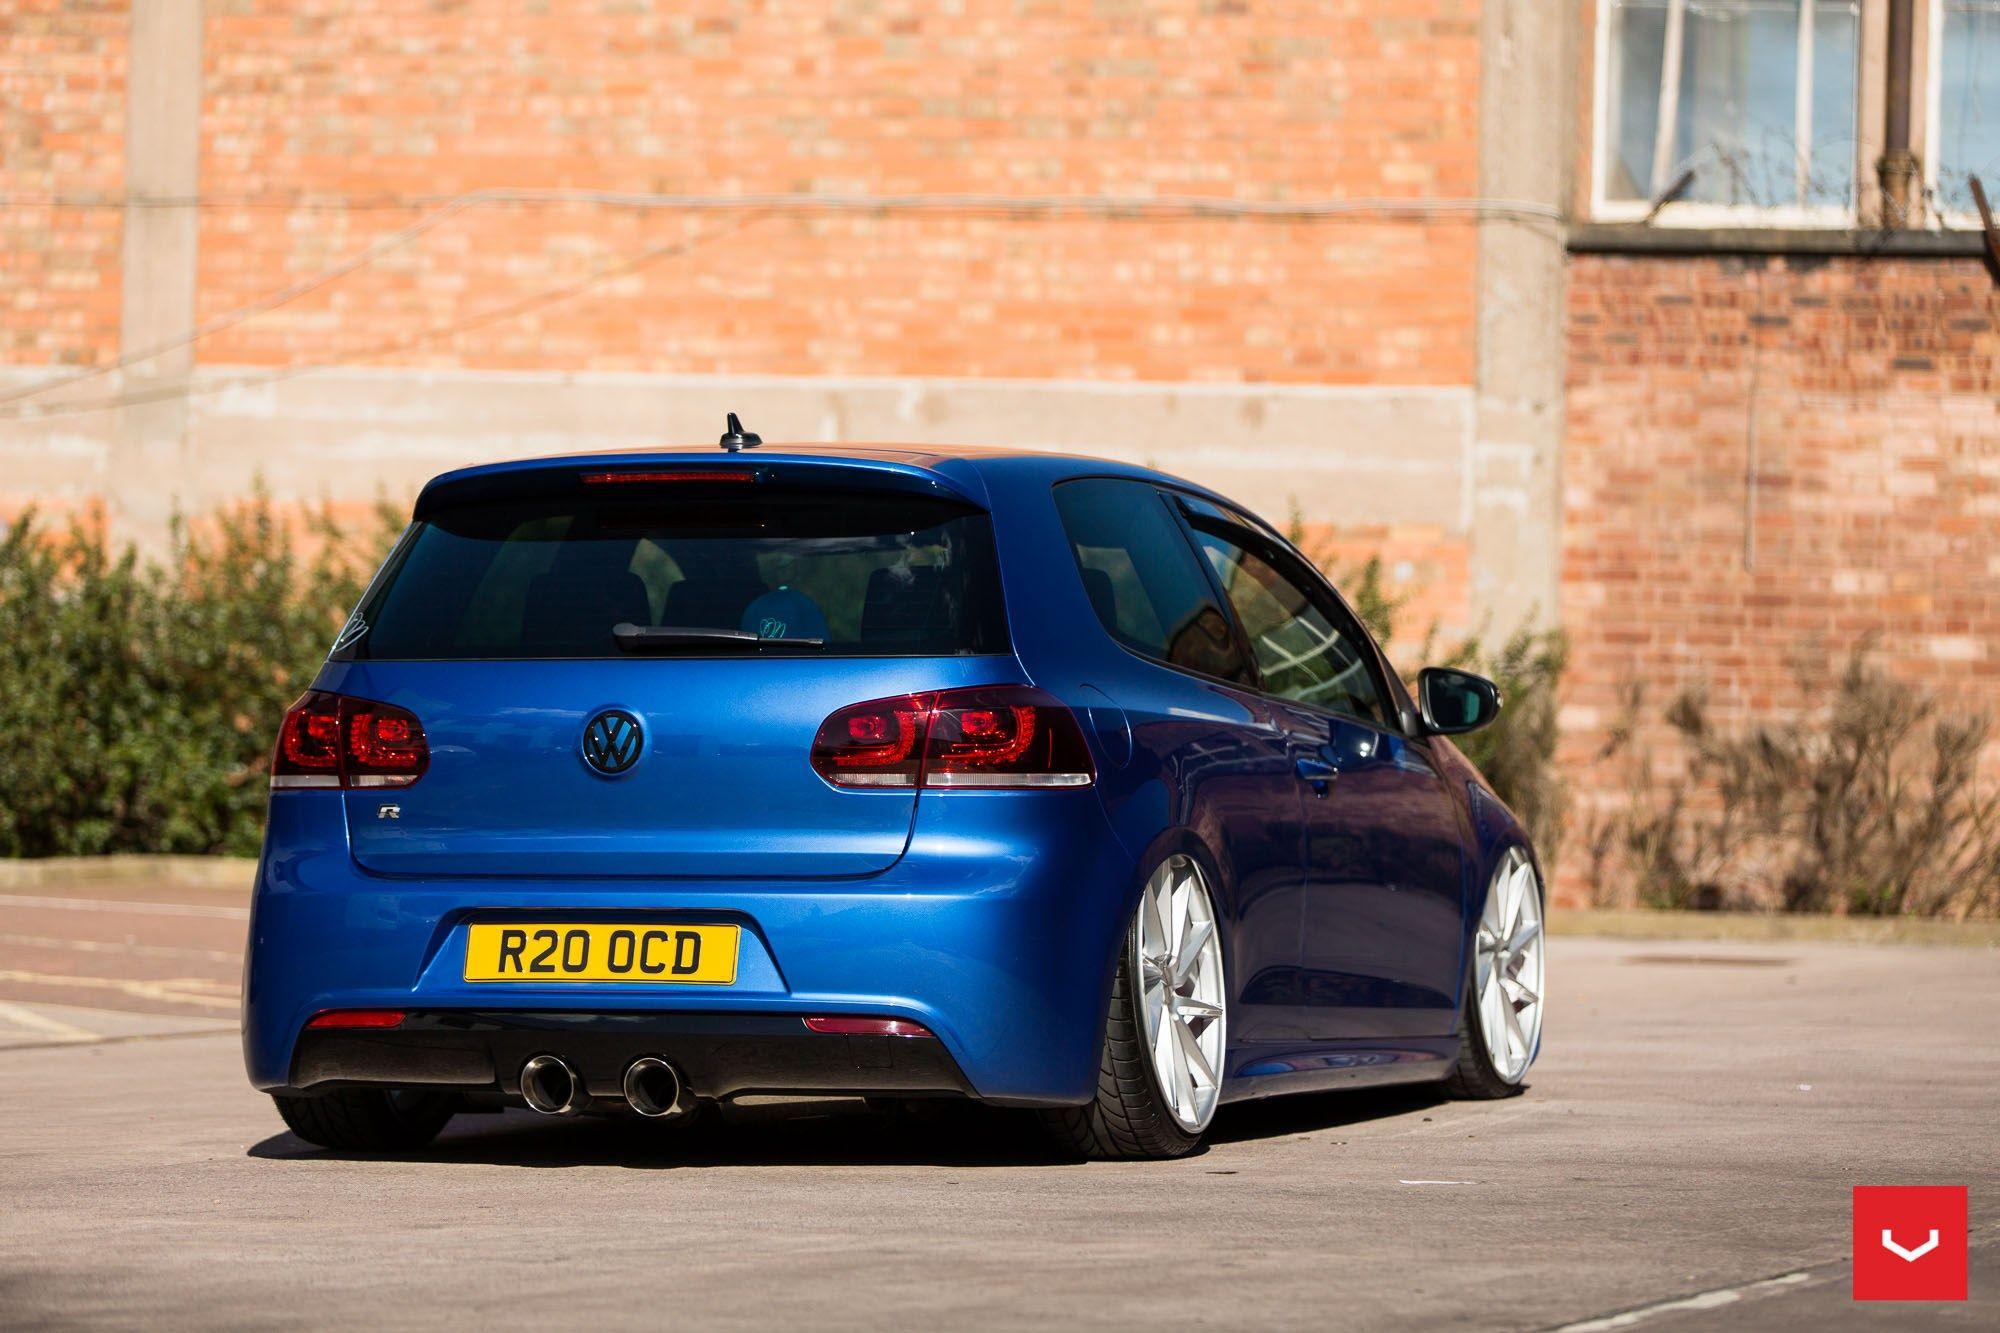 Vw golf r mk6 cars one love - Vossen Wheels Vw Golf R Vossen Cvt